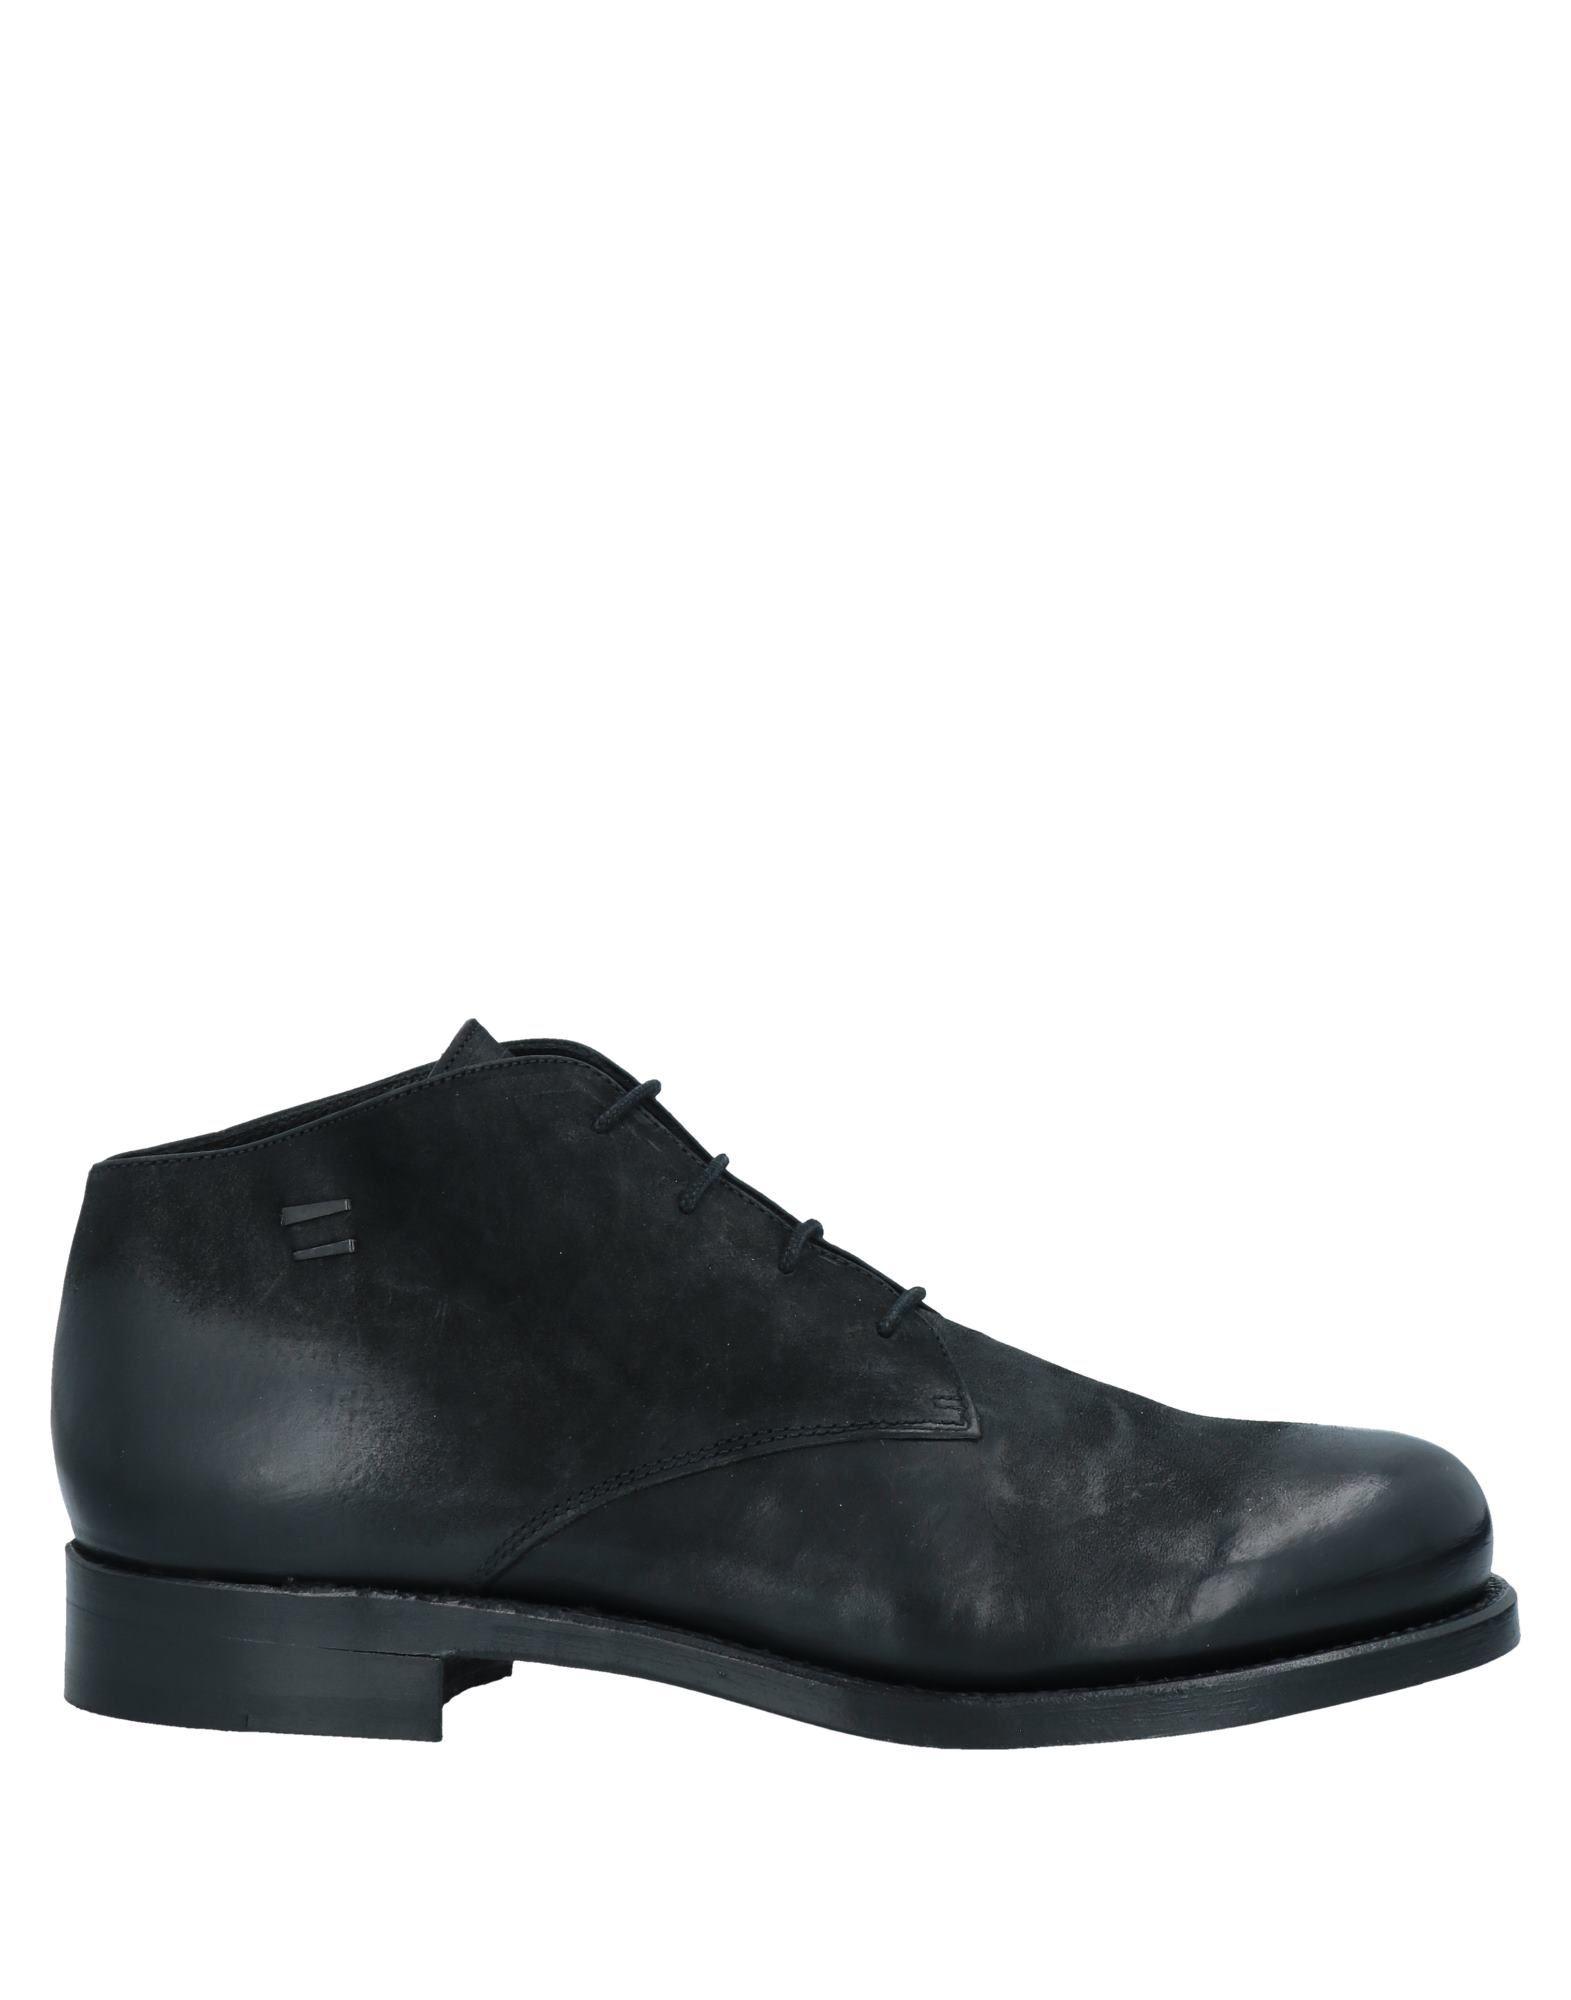 THE LAST CONSPIRACY Полусапоги и высокие ботинки ecco x the last conspiracy полусапоги и высокие ботинки